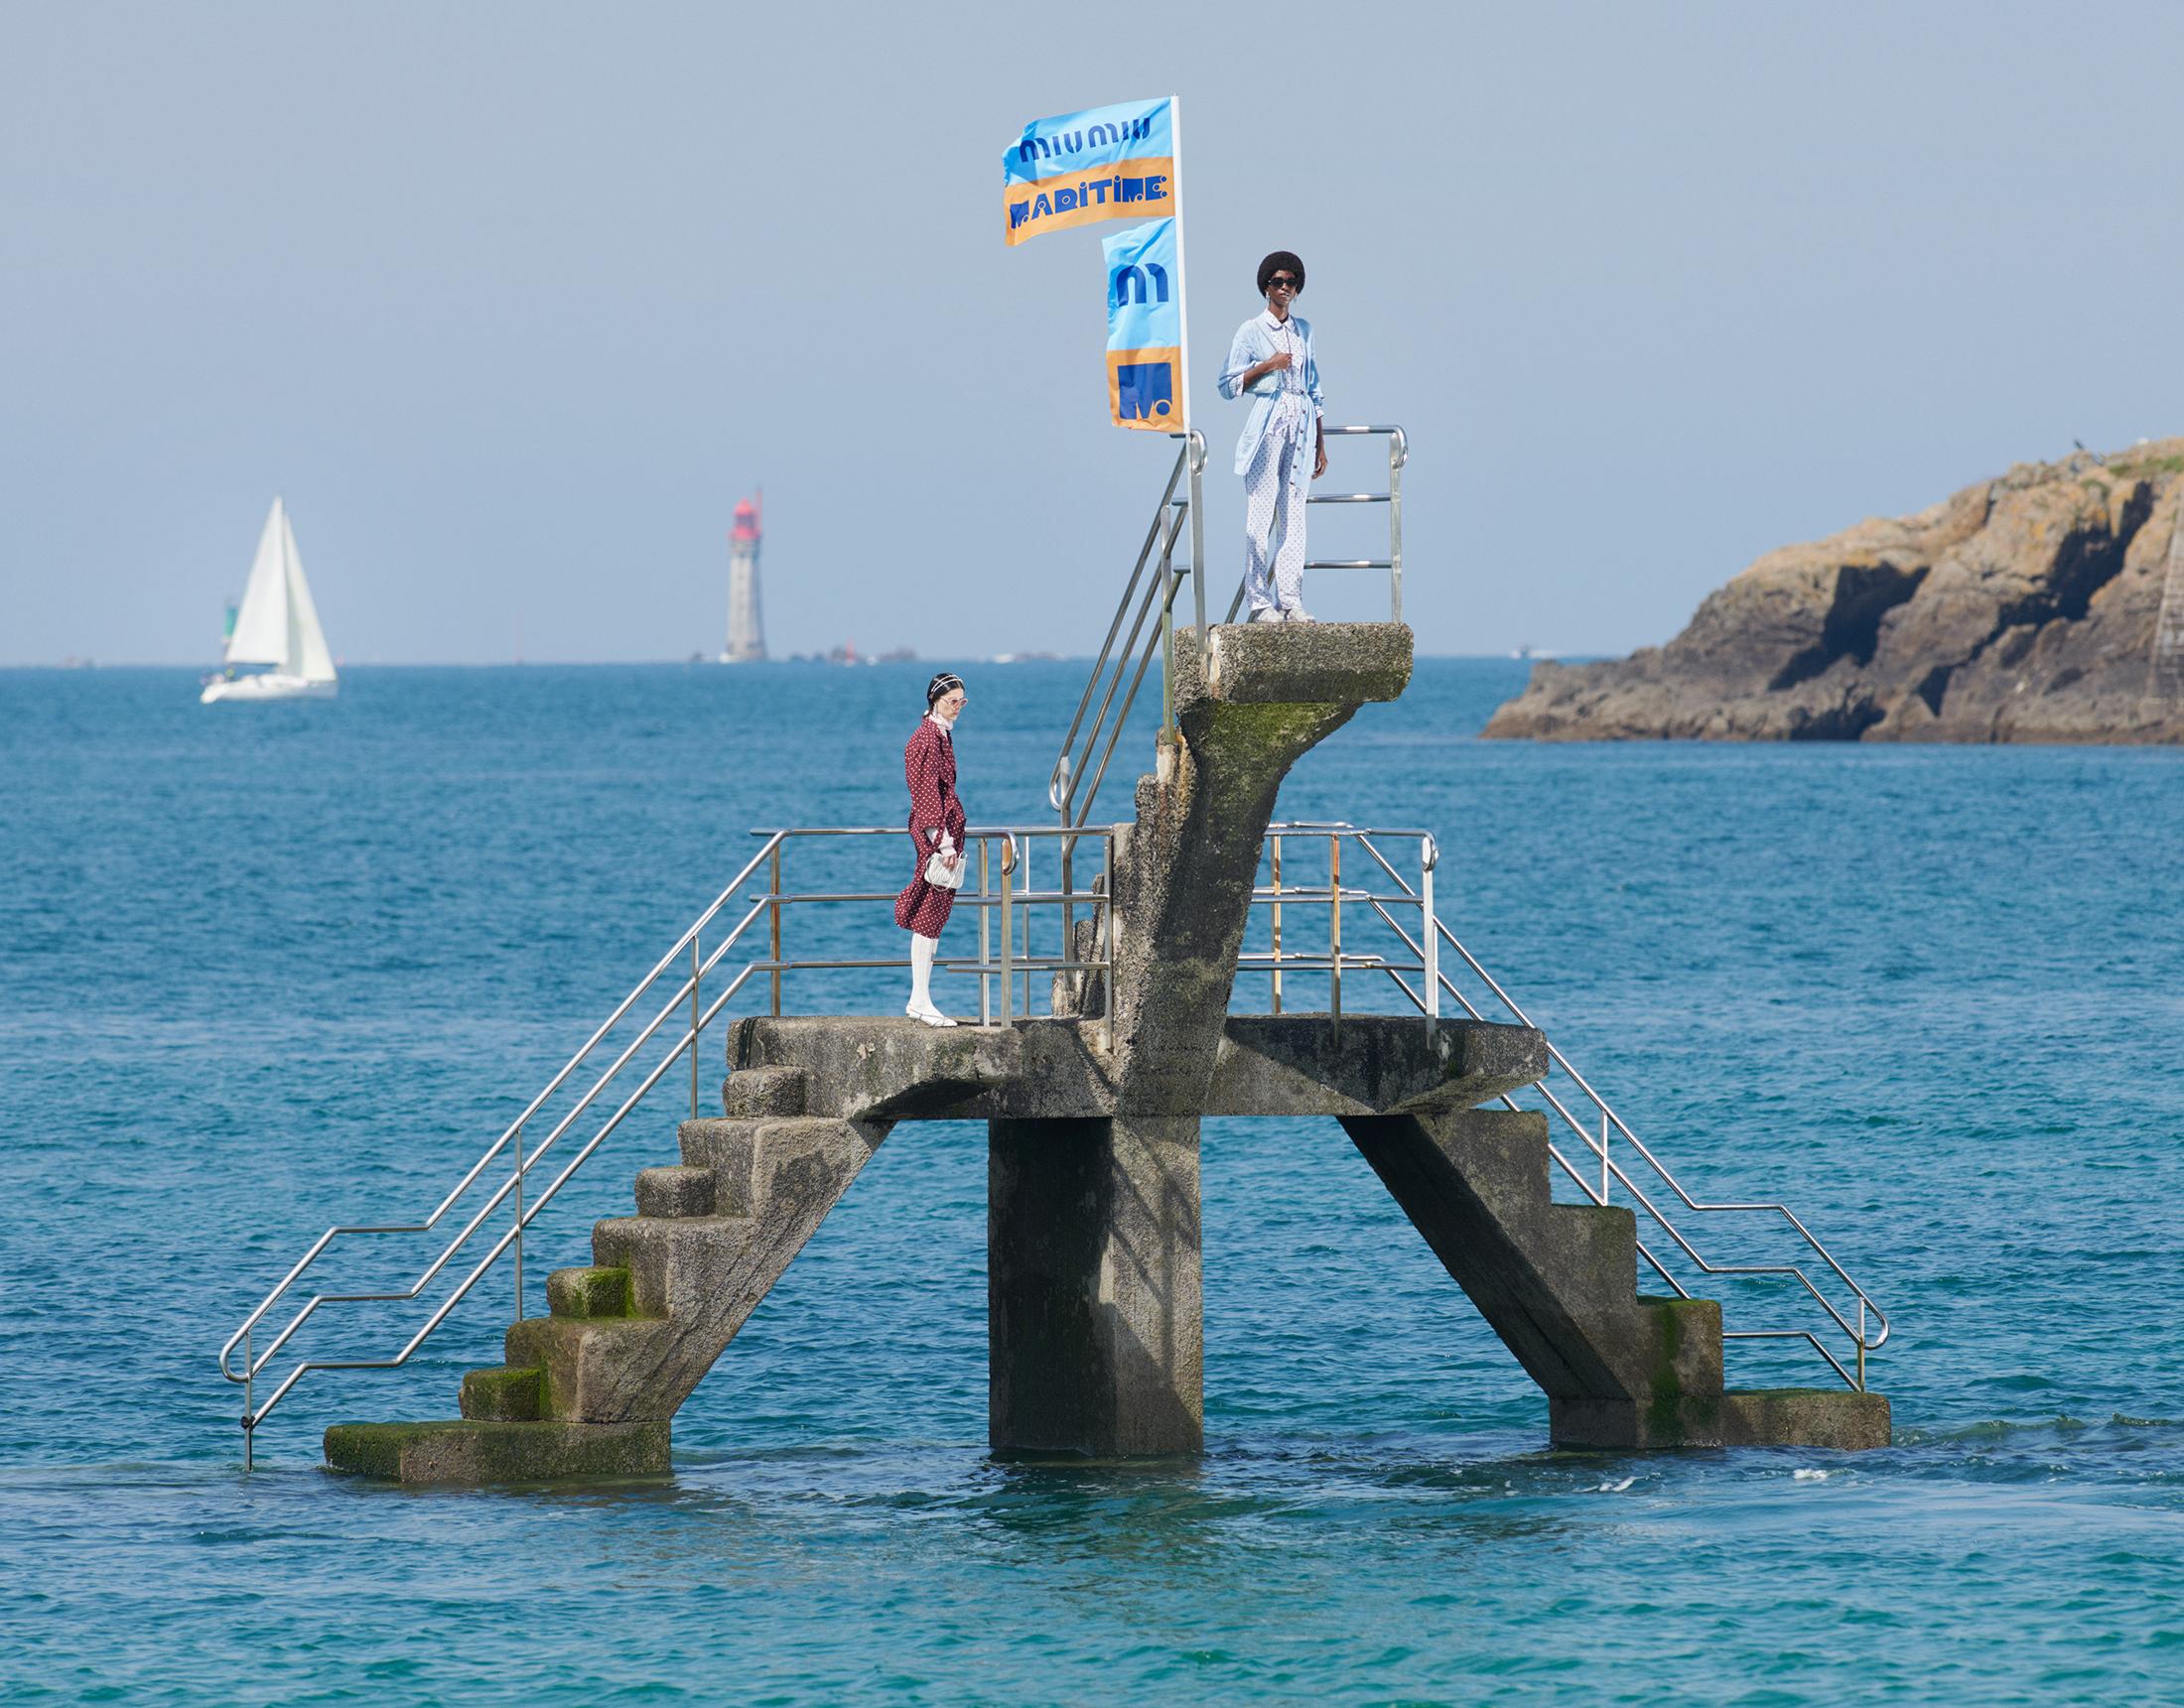 Miu Miu Maritime Summer 2021 Ad Campaign Photos